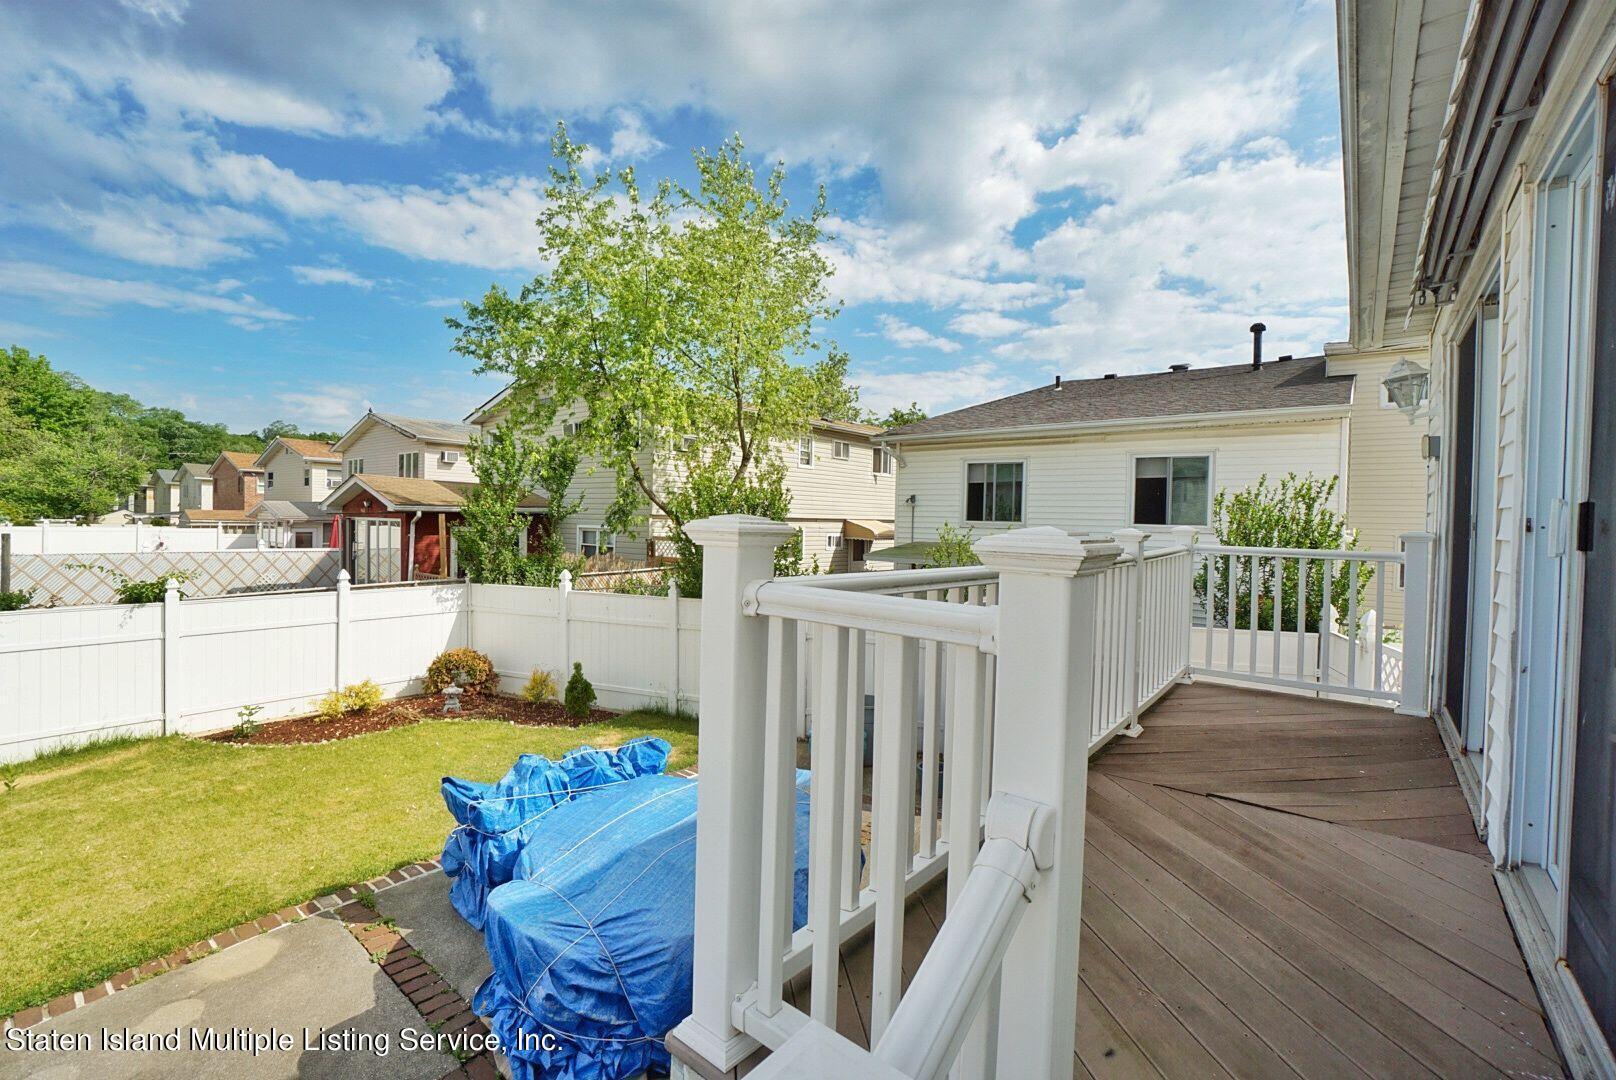 Single Family - Detached 94 Cranford Avenue  Staten Island, NY 10306, MLS-1146620-44